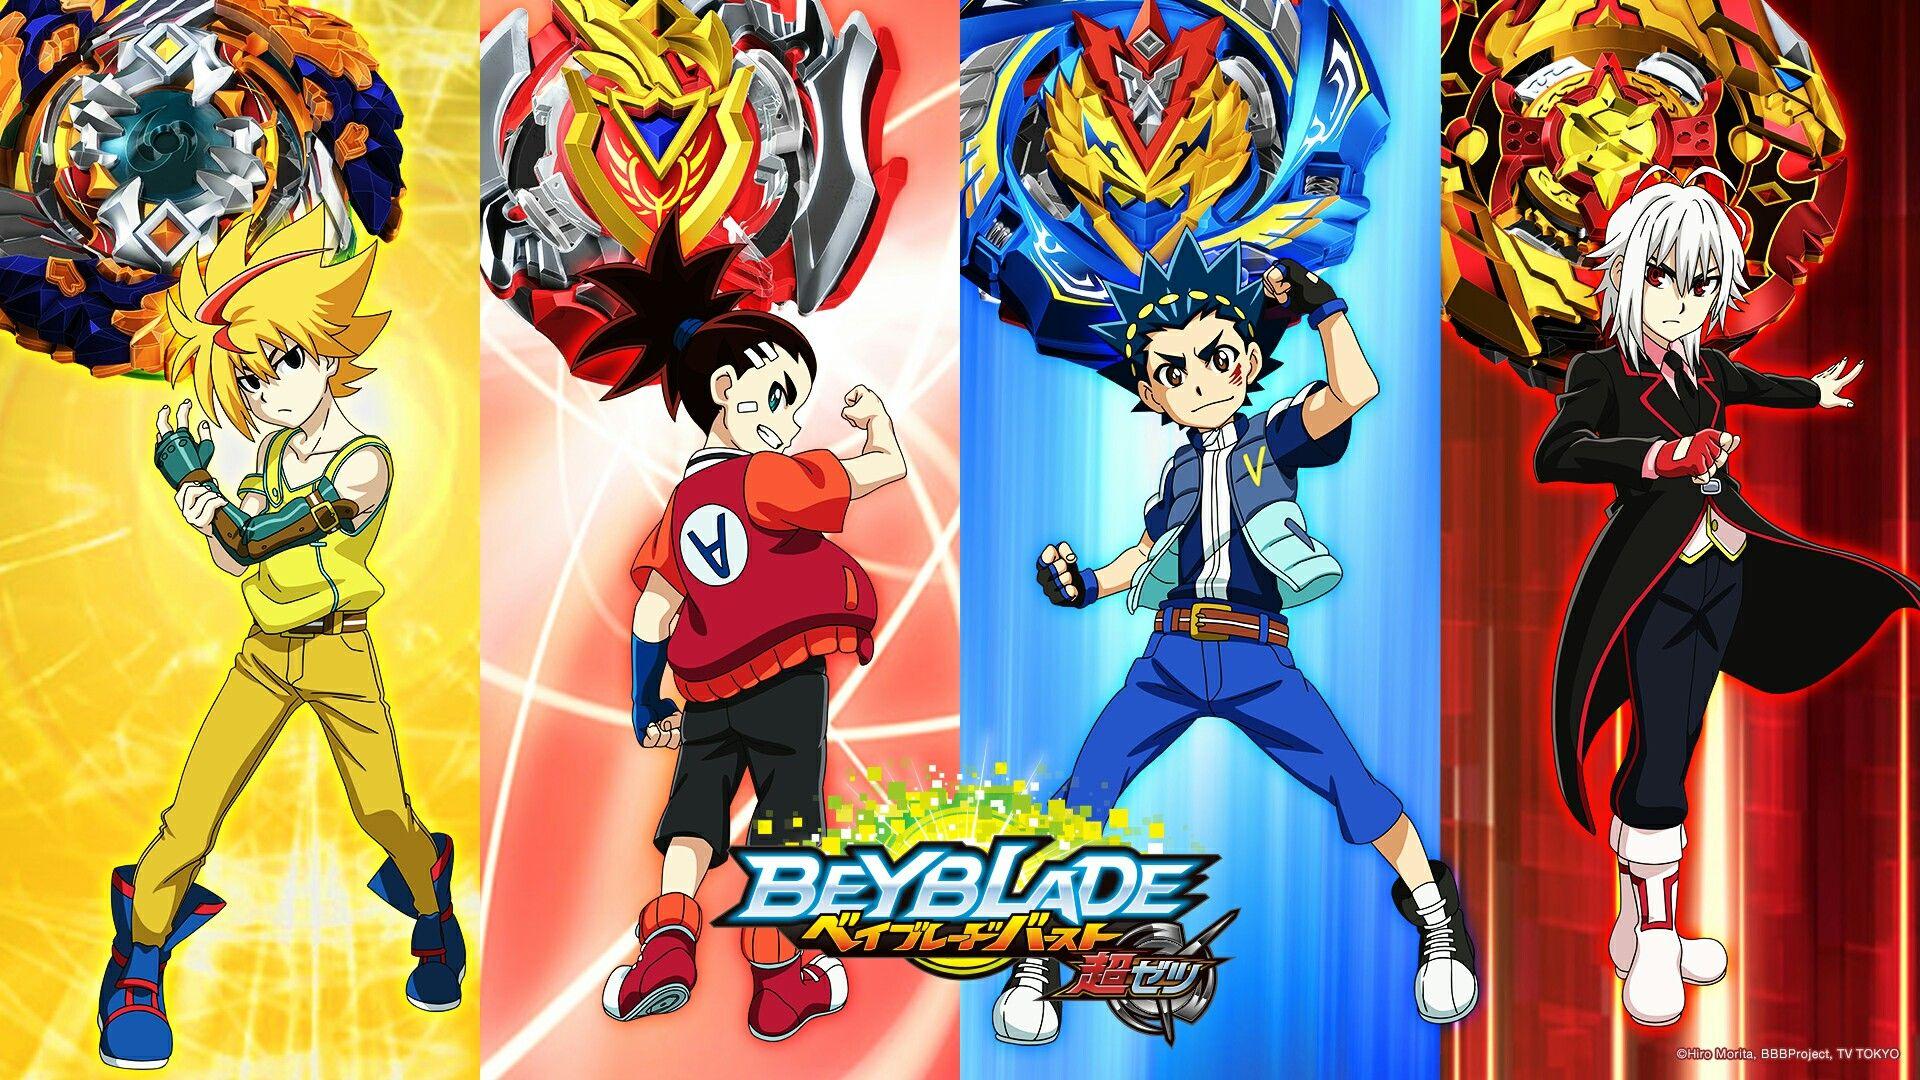 Beyblade Burst Wallpapers Wallpaper Cave Beyblade Burst Anime Beyblade Characters